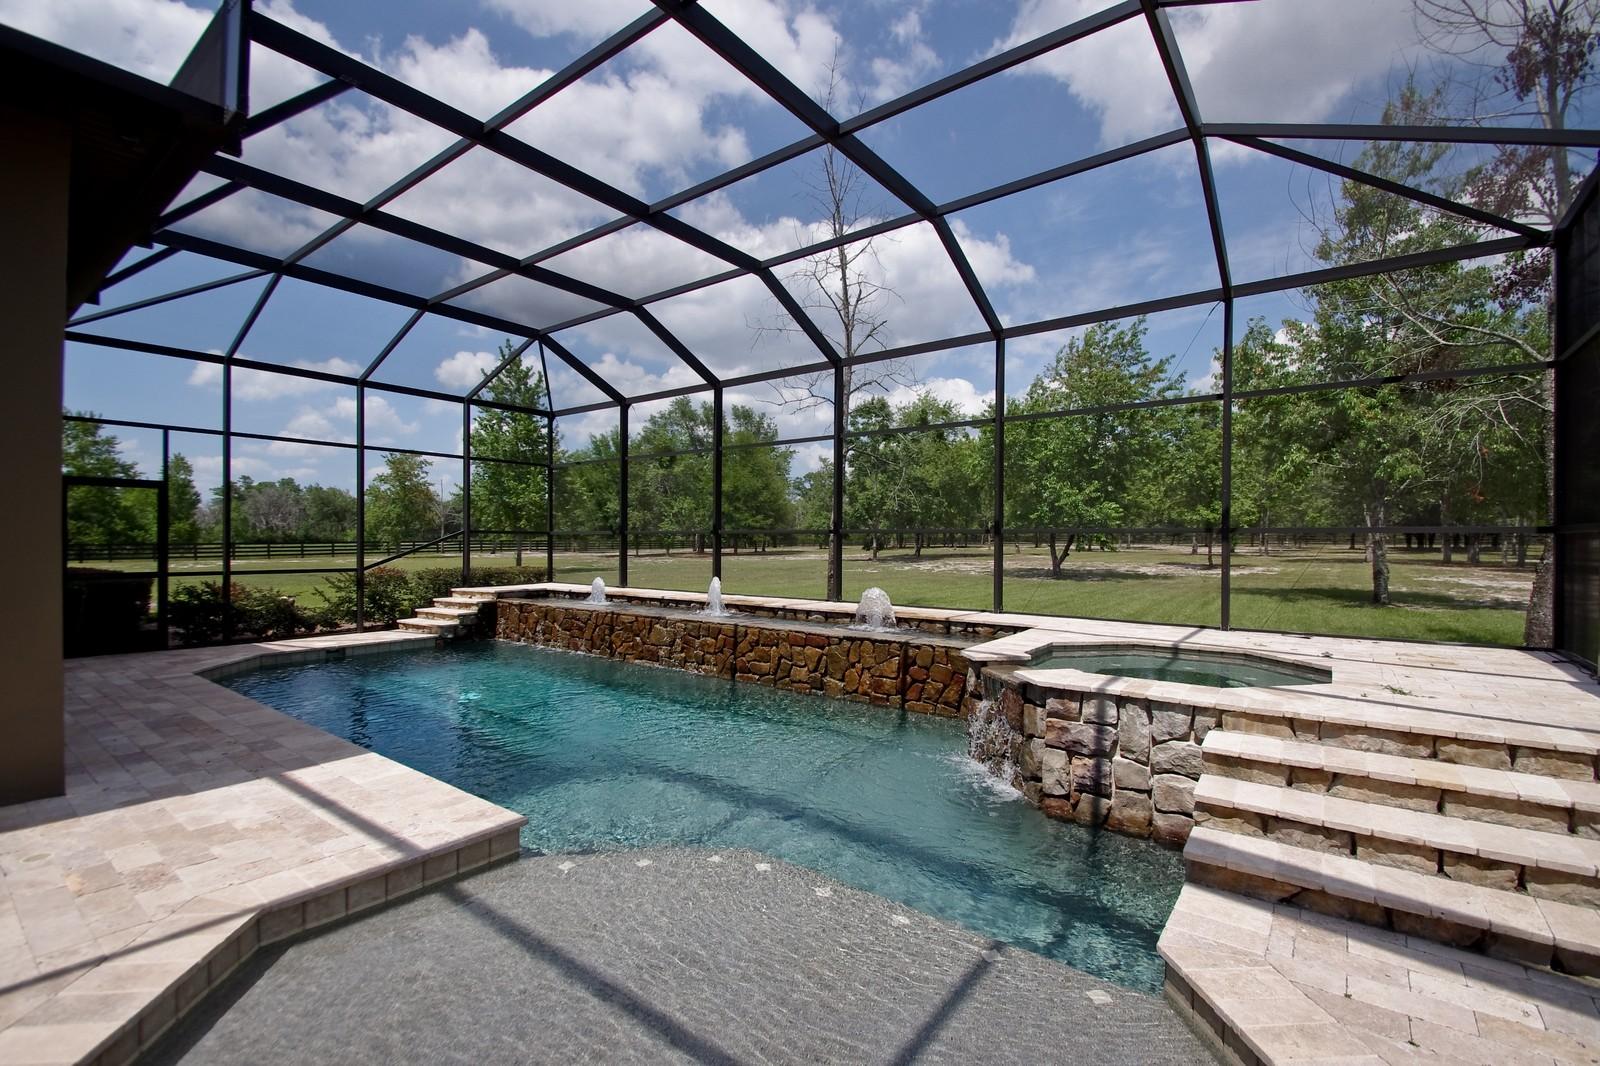 10616 savannah ridge ln winter garden fl 34787 for Winter garden pool